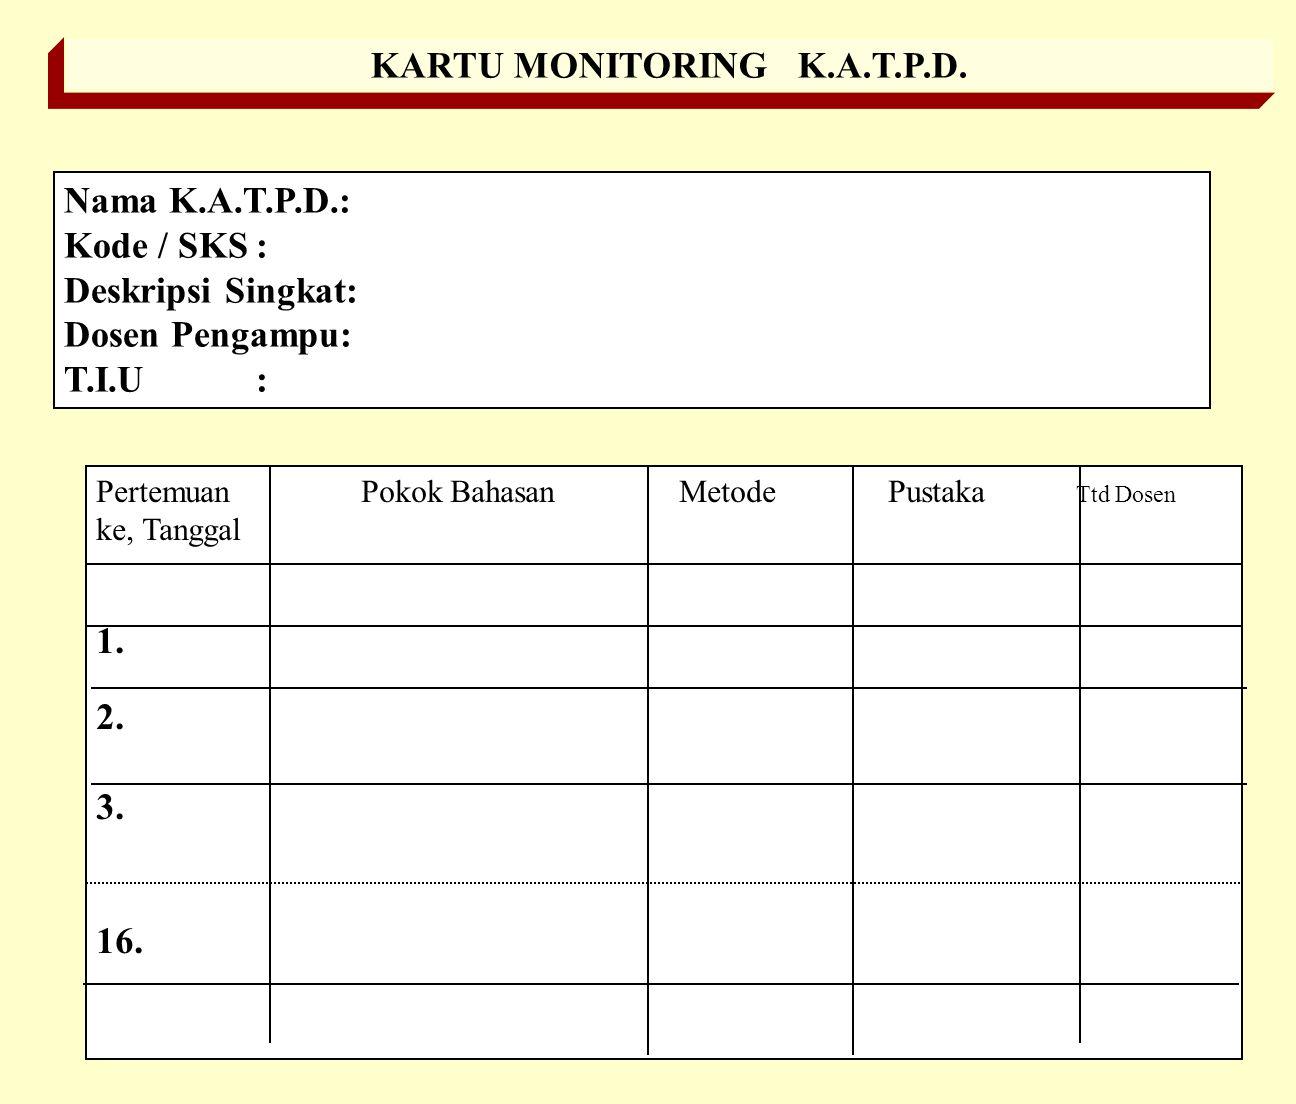 KARTU MONITORING K.A.T.P.D.